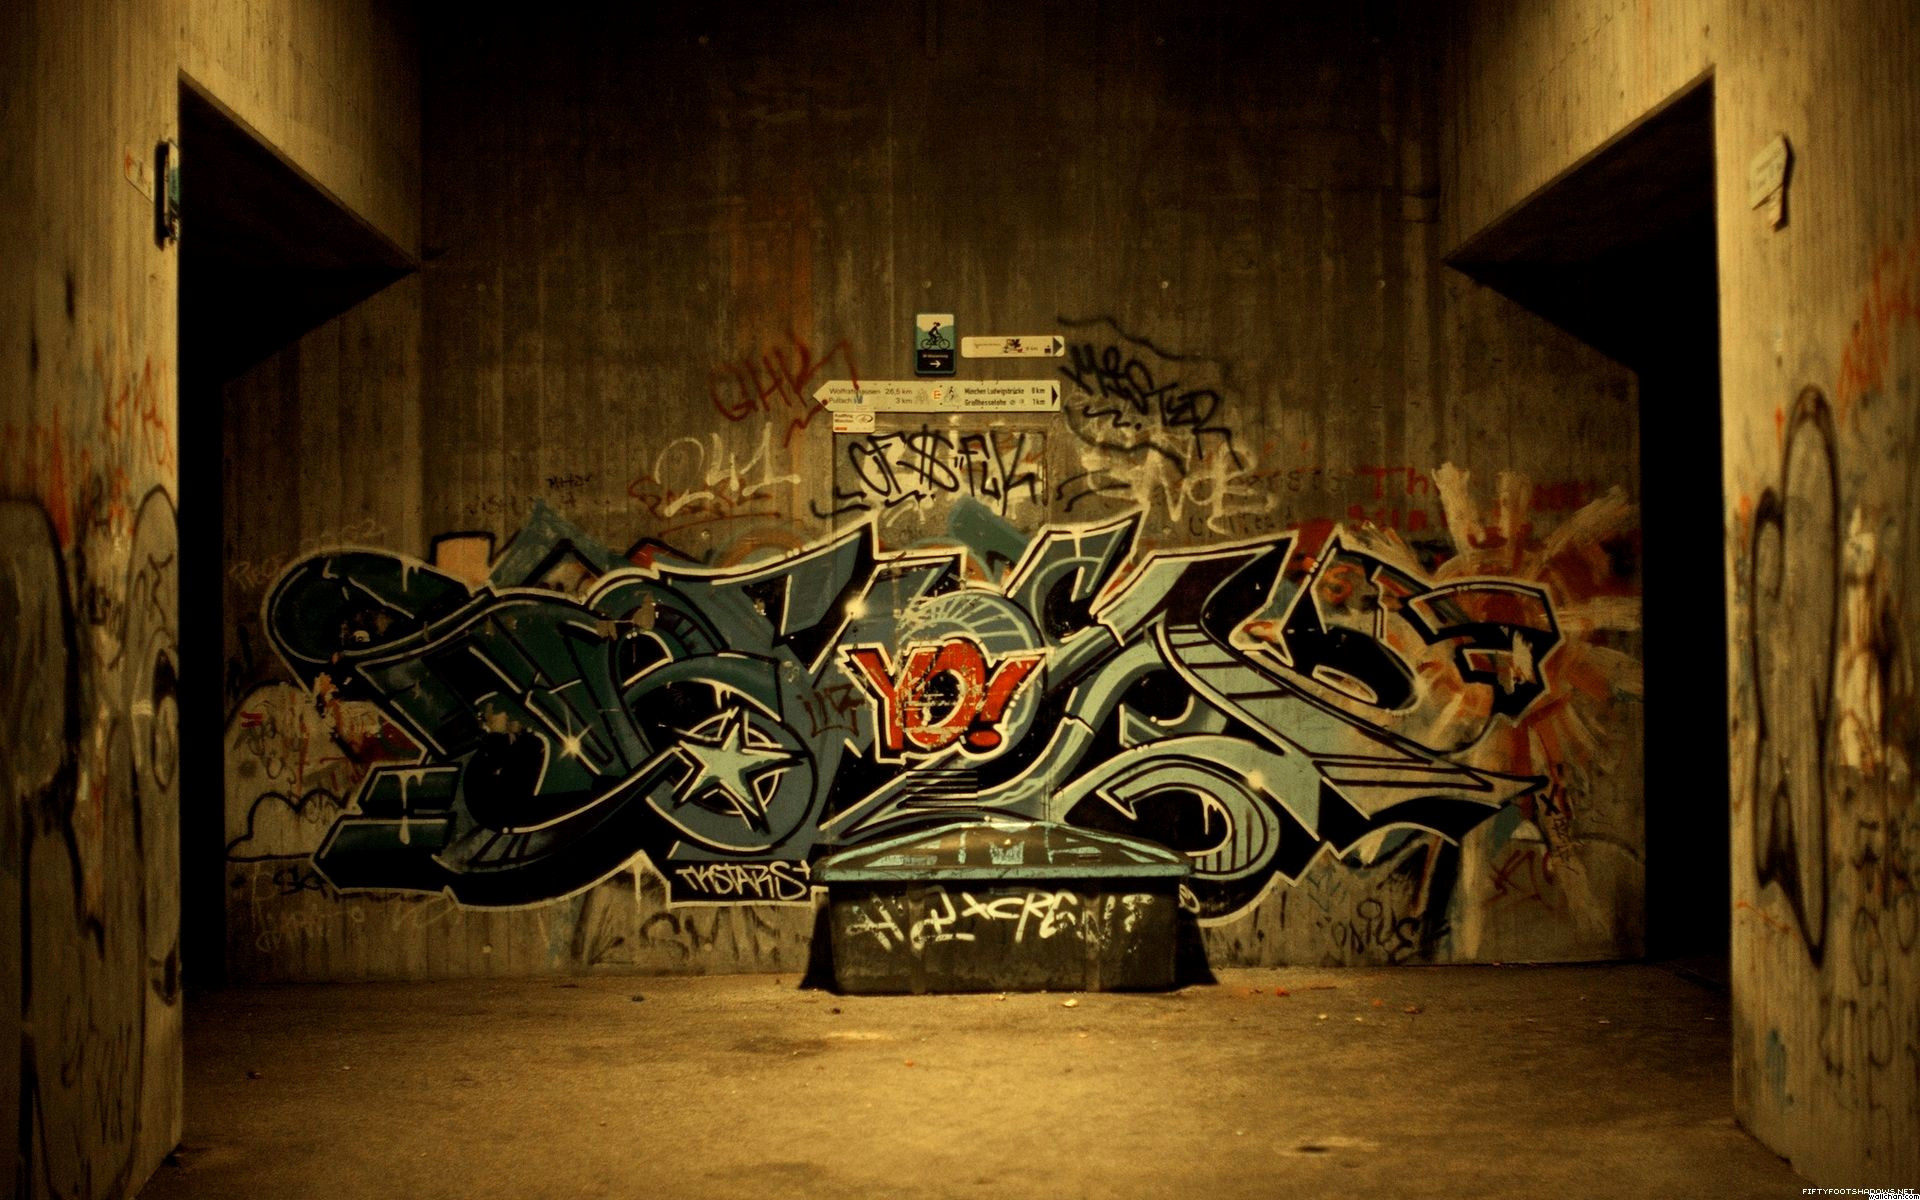 Res: 1920x1200, ... Gangsta Graffiti Wallpaper Beautiful Hip Hop Graffiti Wallpaper 55  Images ...